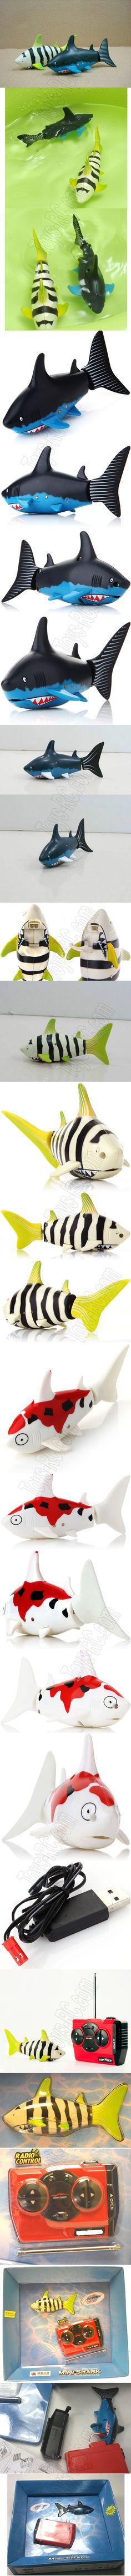 Create Toys 3310B 3CH Electric Micro RC Shark Goldfish Submarine http://www.toys-rc.com/create-toys-3310b-3ch-electric-micro-rc-shark-goldfish-submarine-p-293.html